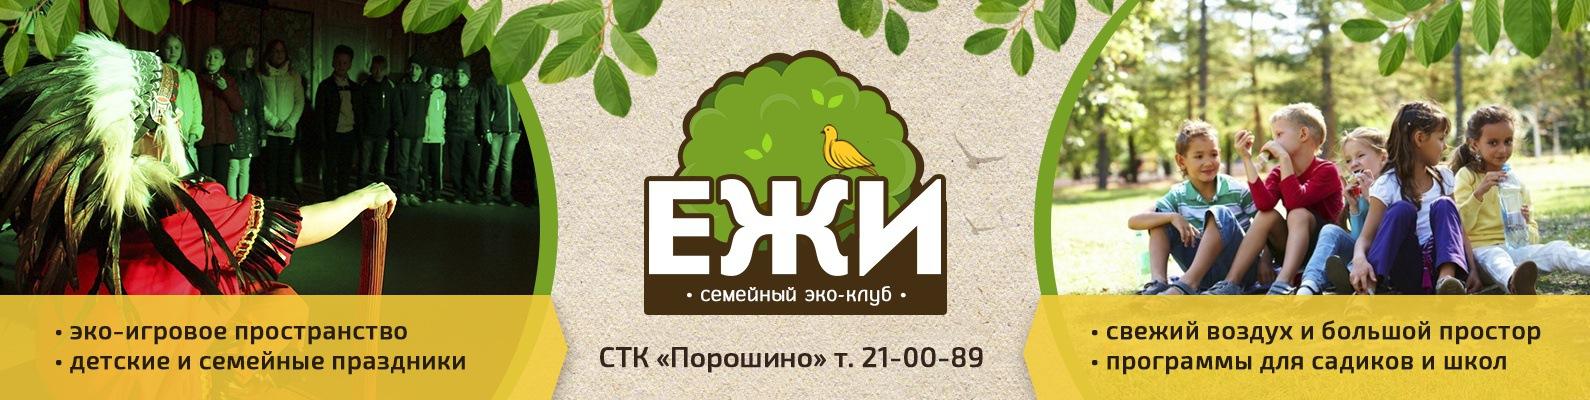 Картинки по запросу эко-клуб Ежи